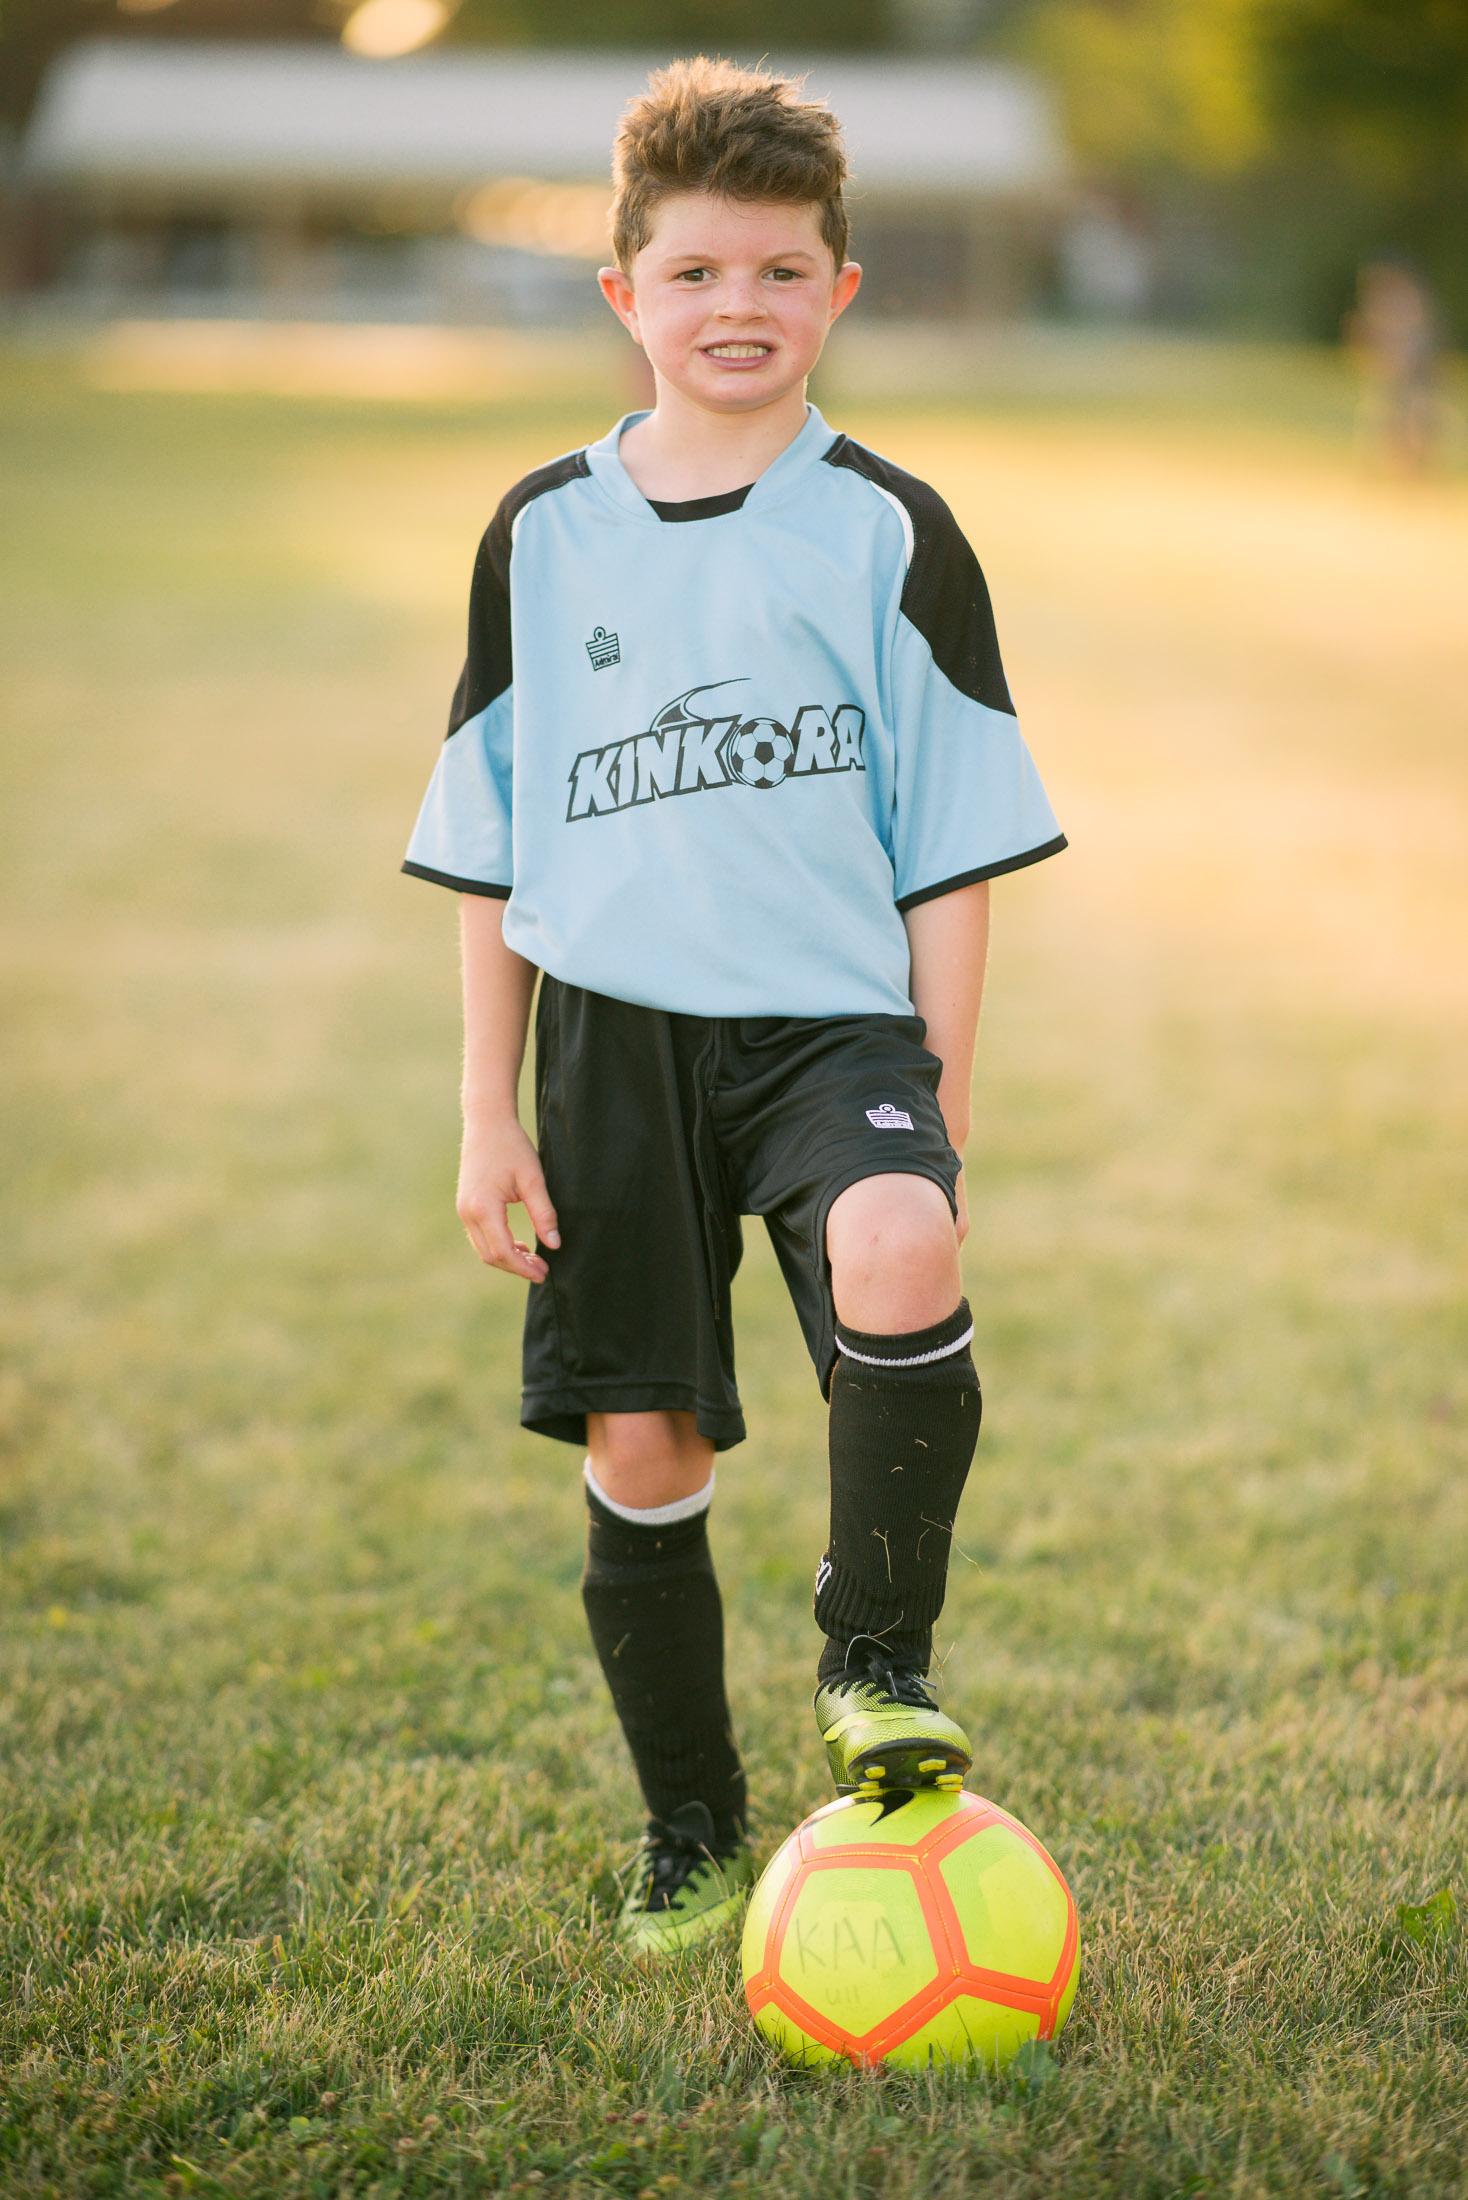 Kinkora-Soccer-Photos-044.jpg